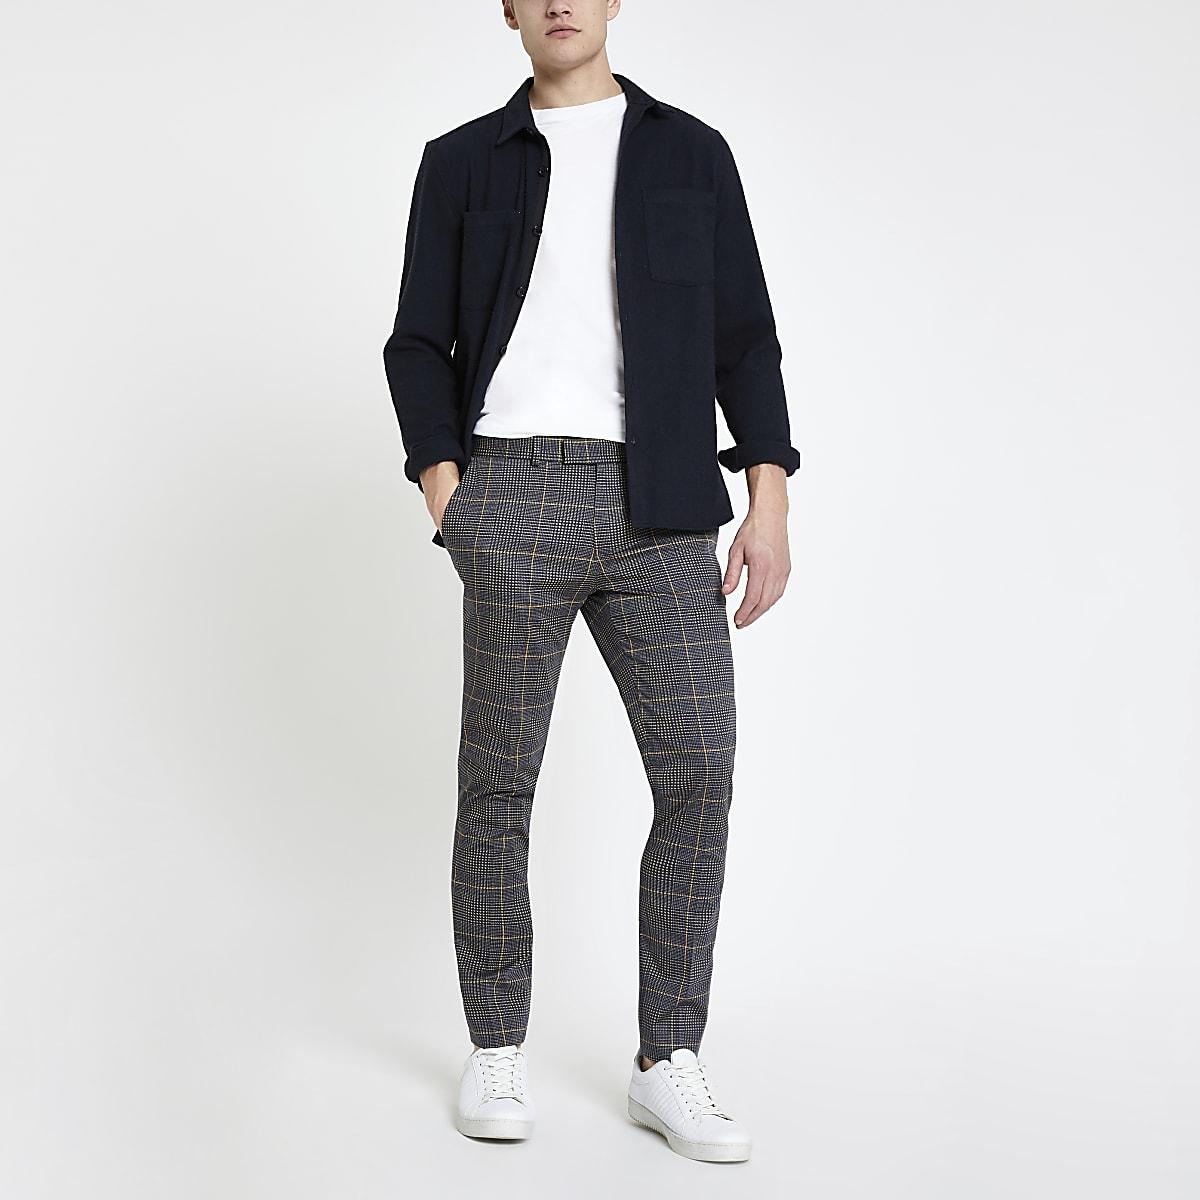 Dunkelgraue, elegante Super Skinny Hose mit Karos